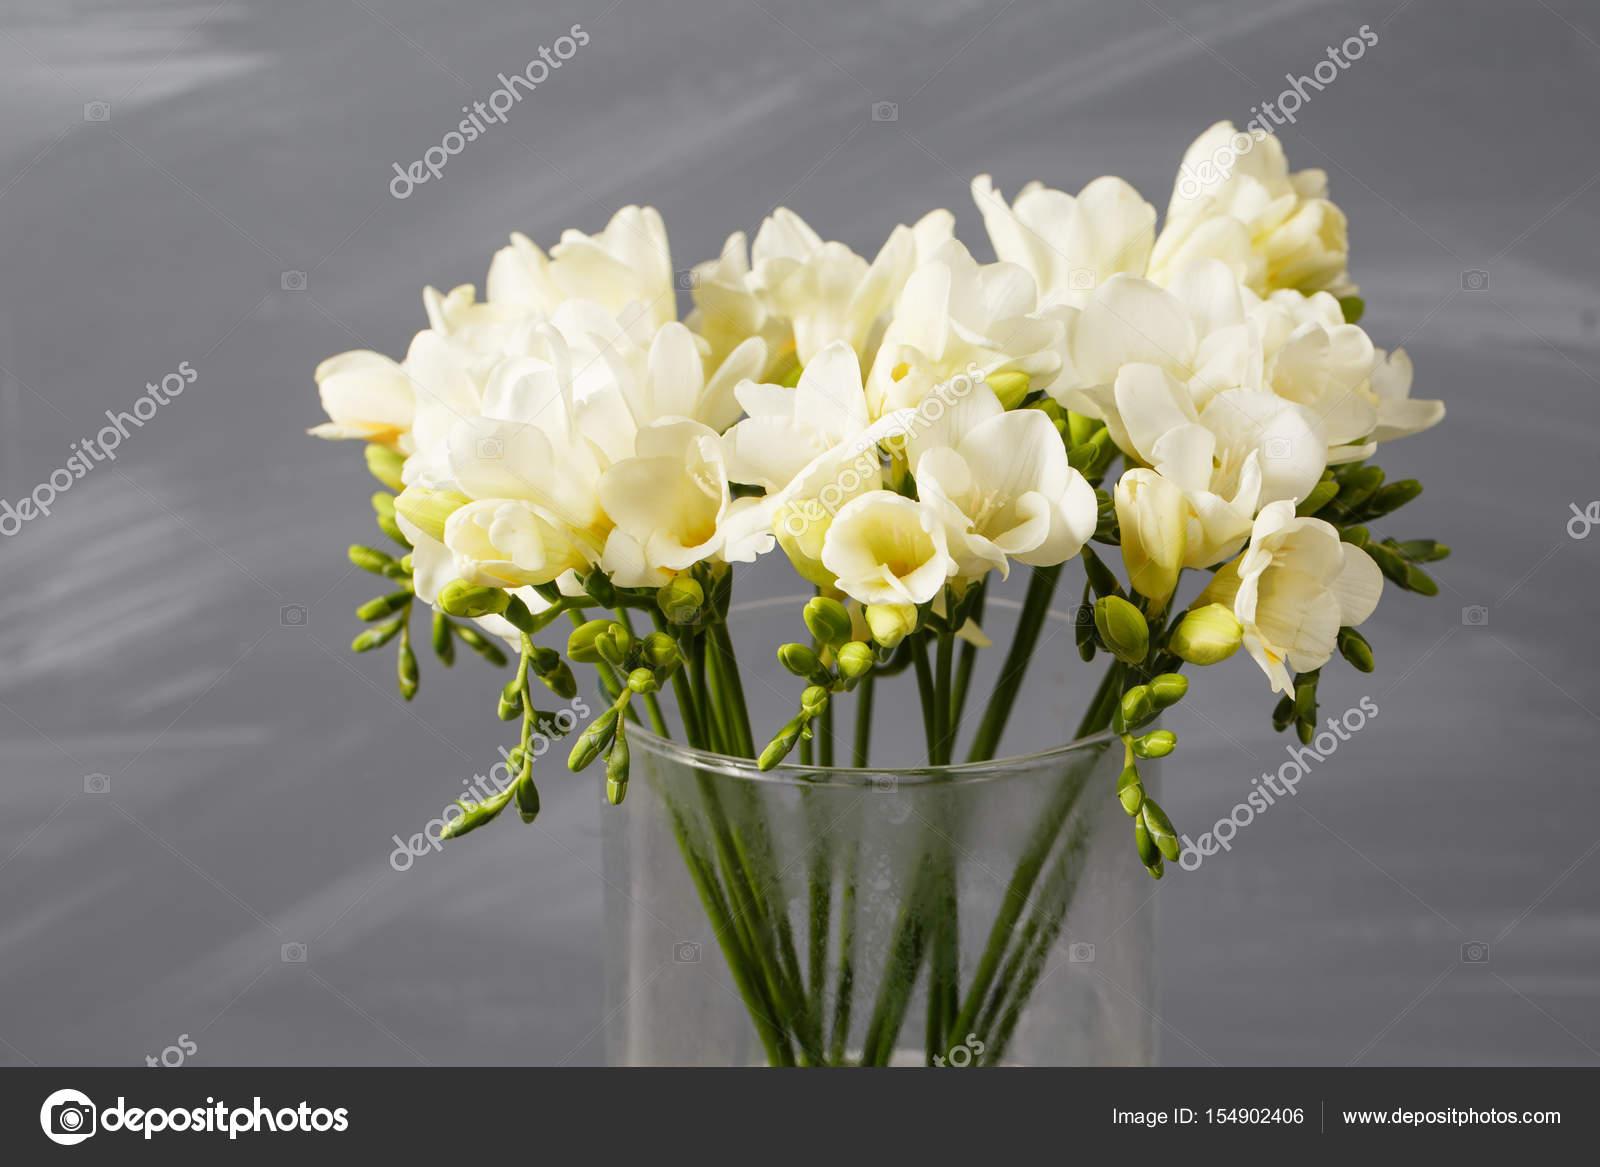 White freesia flowers in decorative vase on a background of gray white freesia flowers in decorative vase on a background of gray wall stock photo mightylinksfo